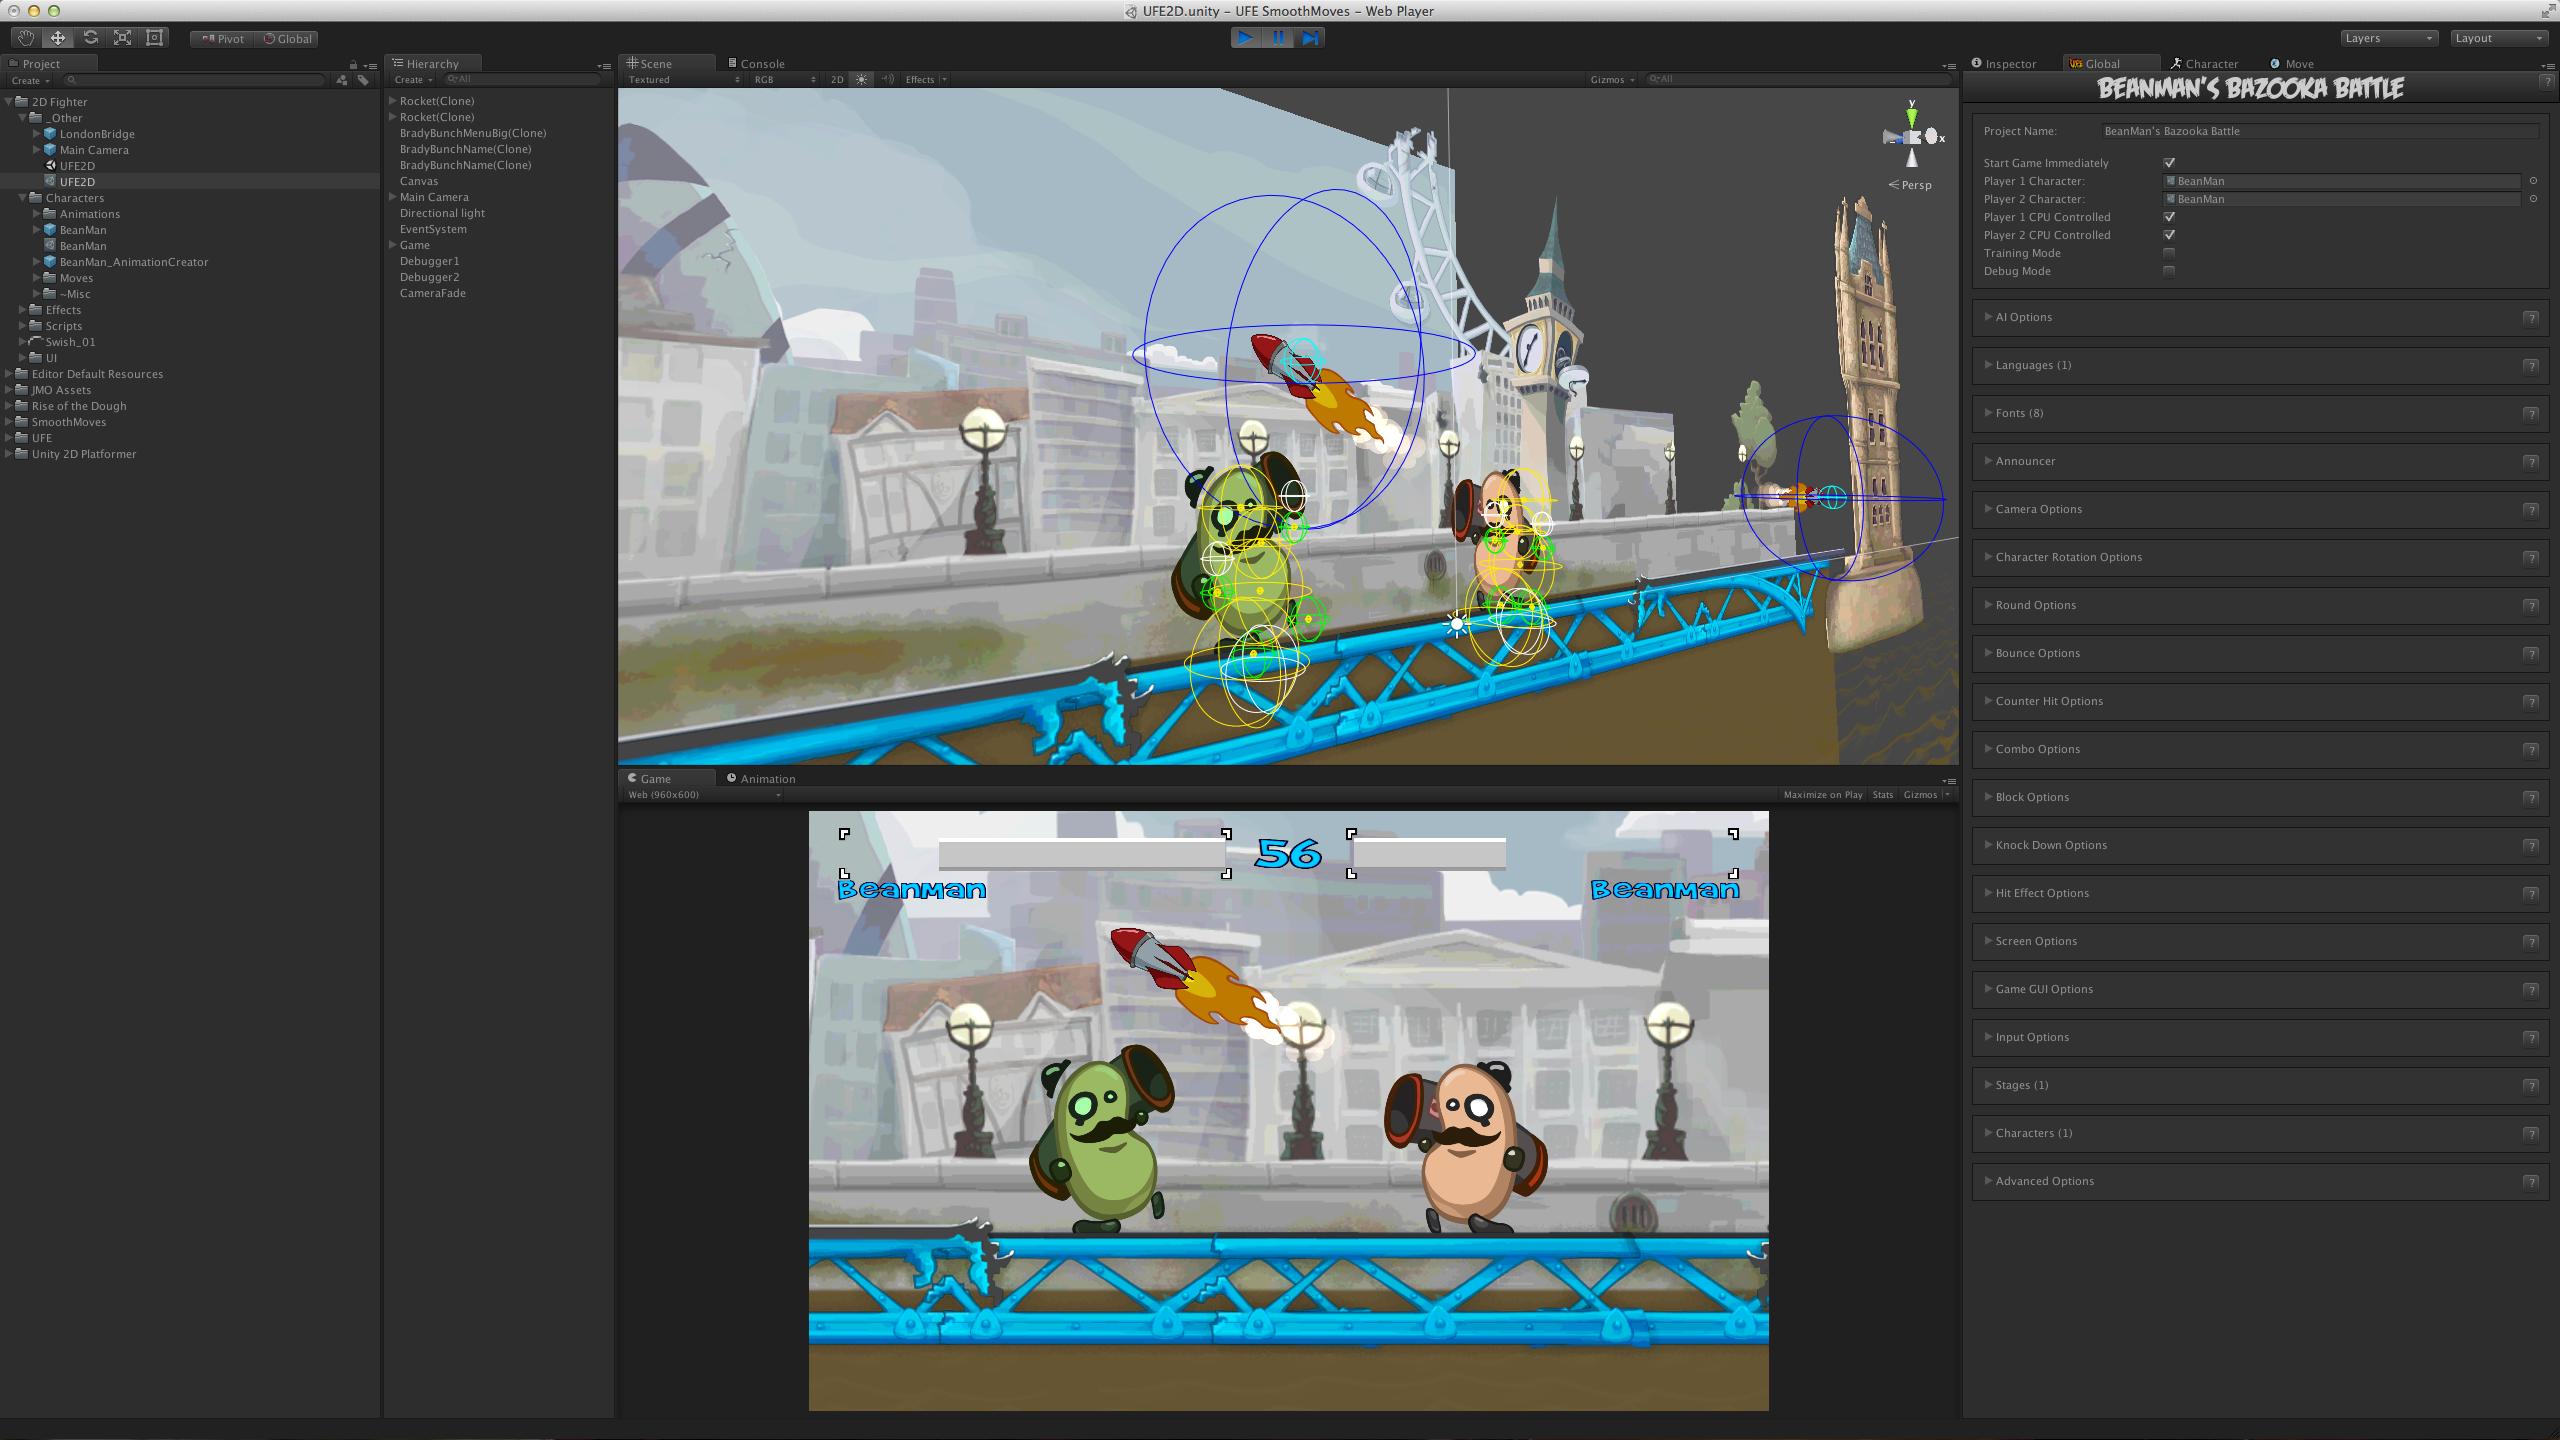 Universal Fighting Engine | BeanMan's Bazooka Battle!